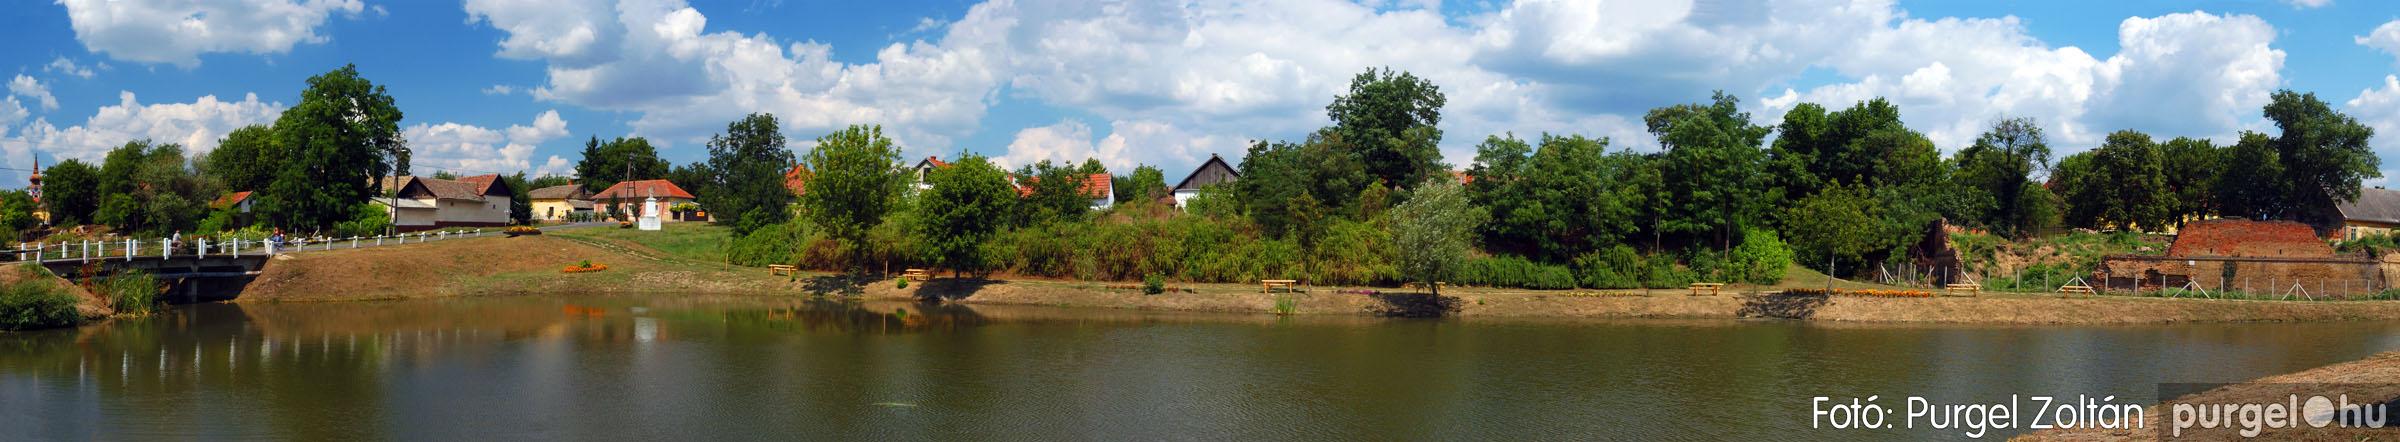 037 Örök pillanatok fotókiállításom képei - Kurca panoráma · Kurca panorama - Fotó:PURGEL ZOLTÁN©.jpg